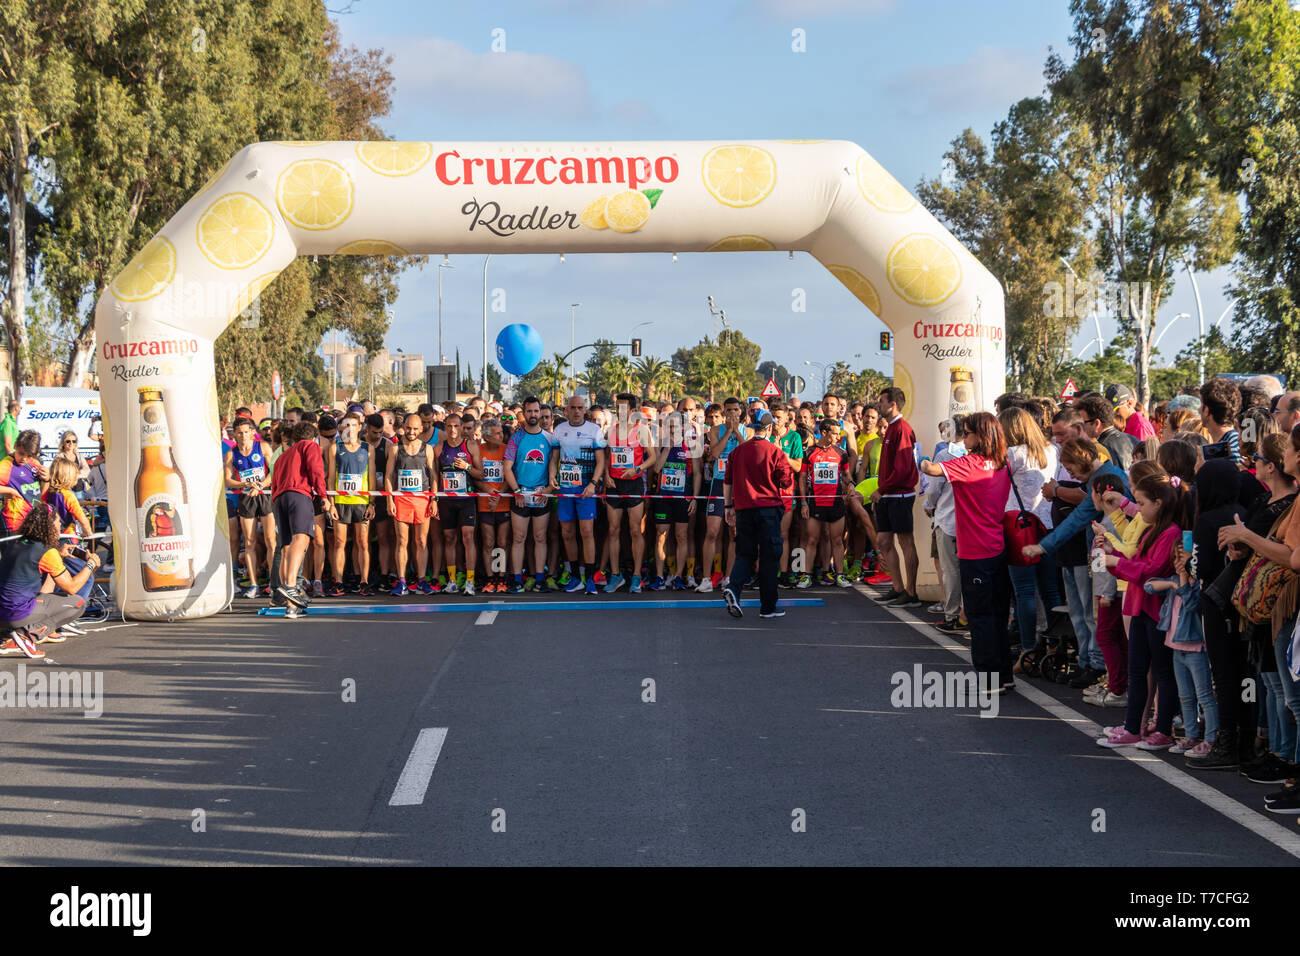 Huelva, Spain - May 4, 2019:  Runners at the start of the Huelva solidary 10K Run on May 2019. The first 10K race held in Huelva - Stock Image